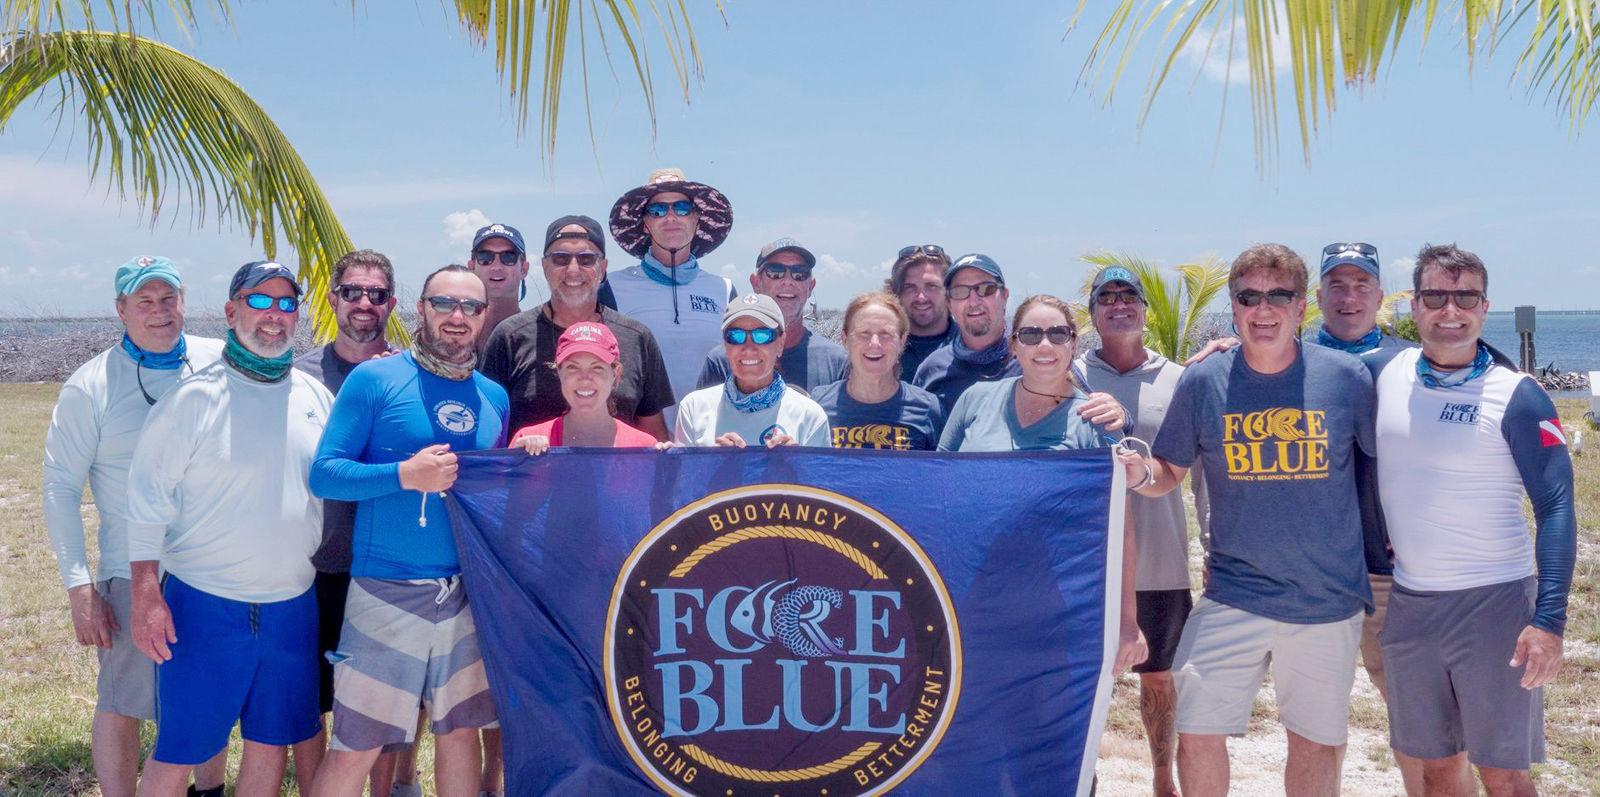 Harbor Branch Oceanographic Institute and Force Blue turtle team